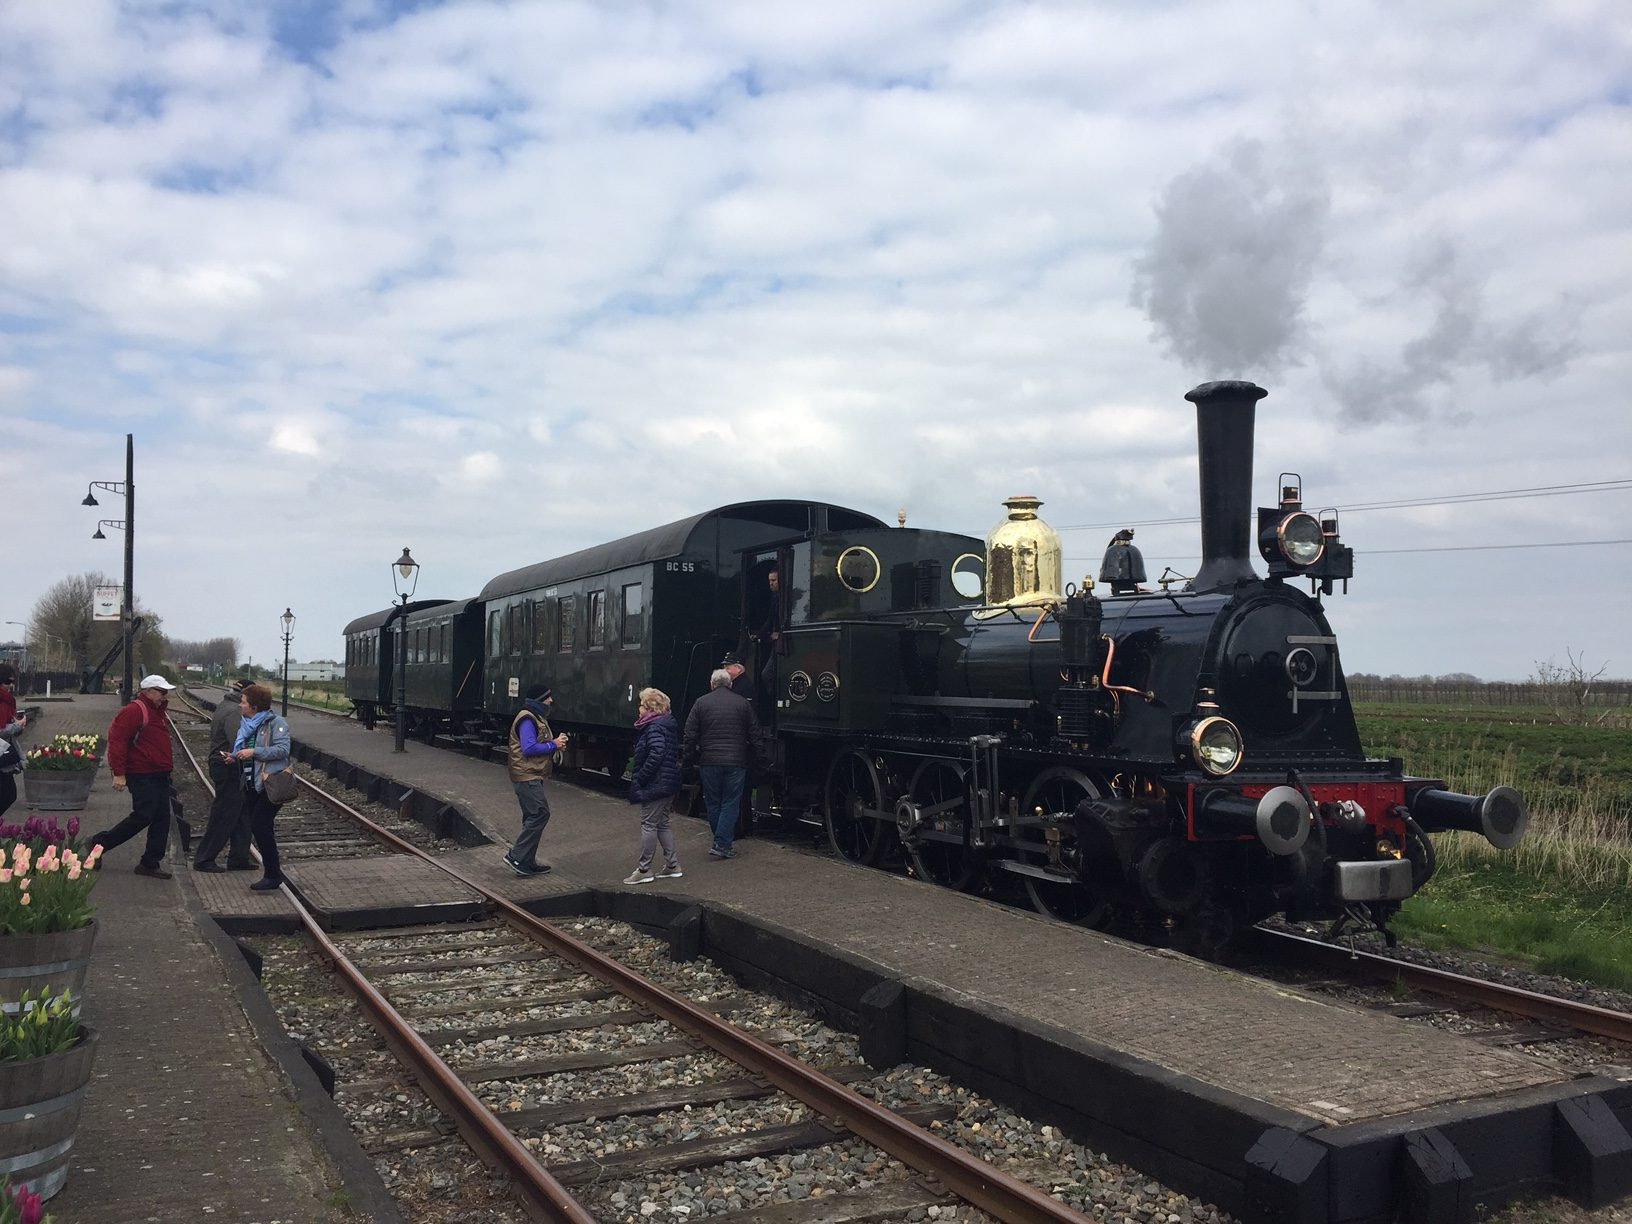 Guided tour Hoorn - Steam train Hoorn-Enkhuizen